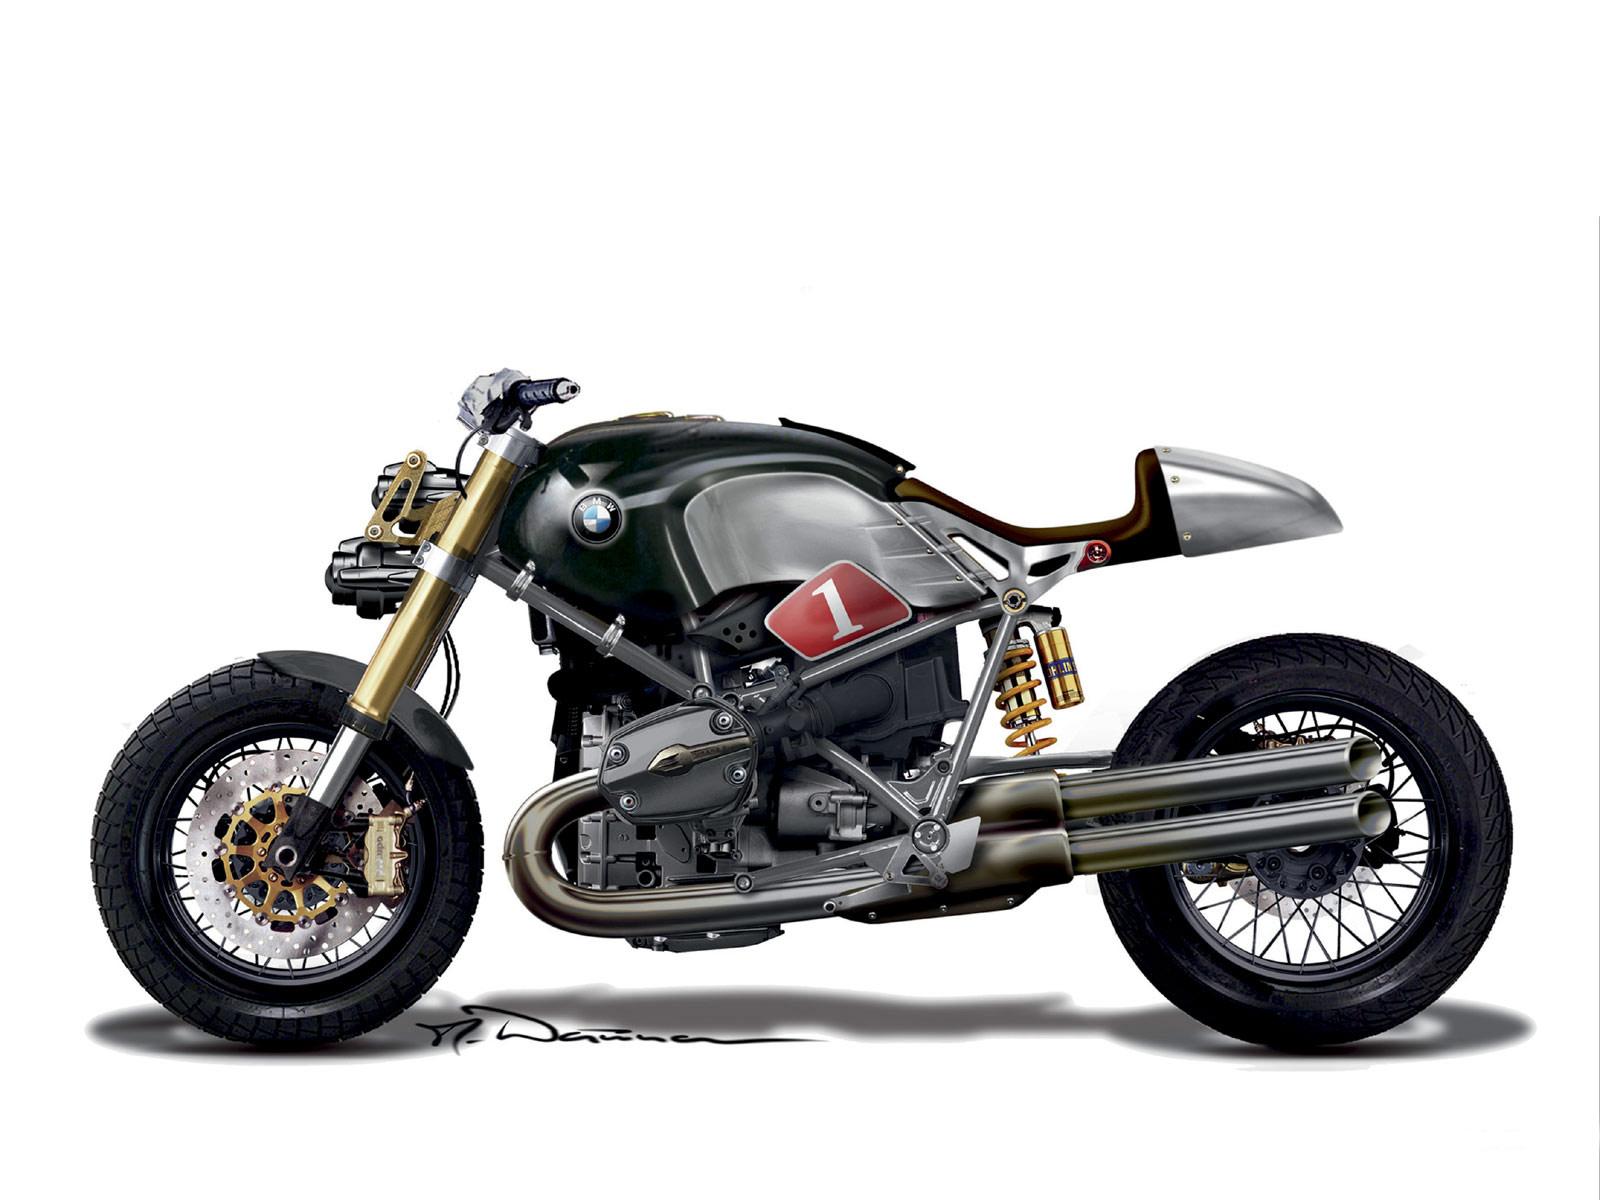 2009 BMW Lo Rider Motorcycle Desktop Wallpaper specifications 1600x1200